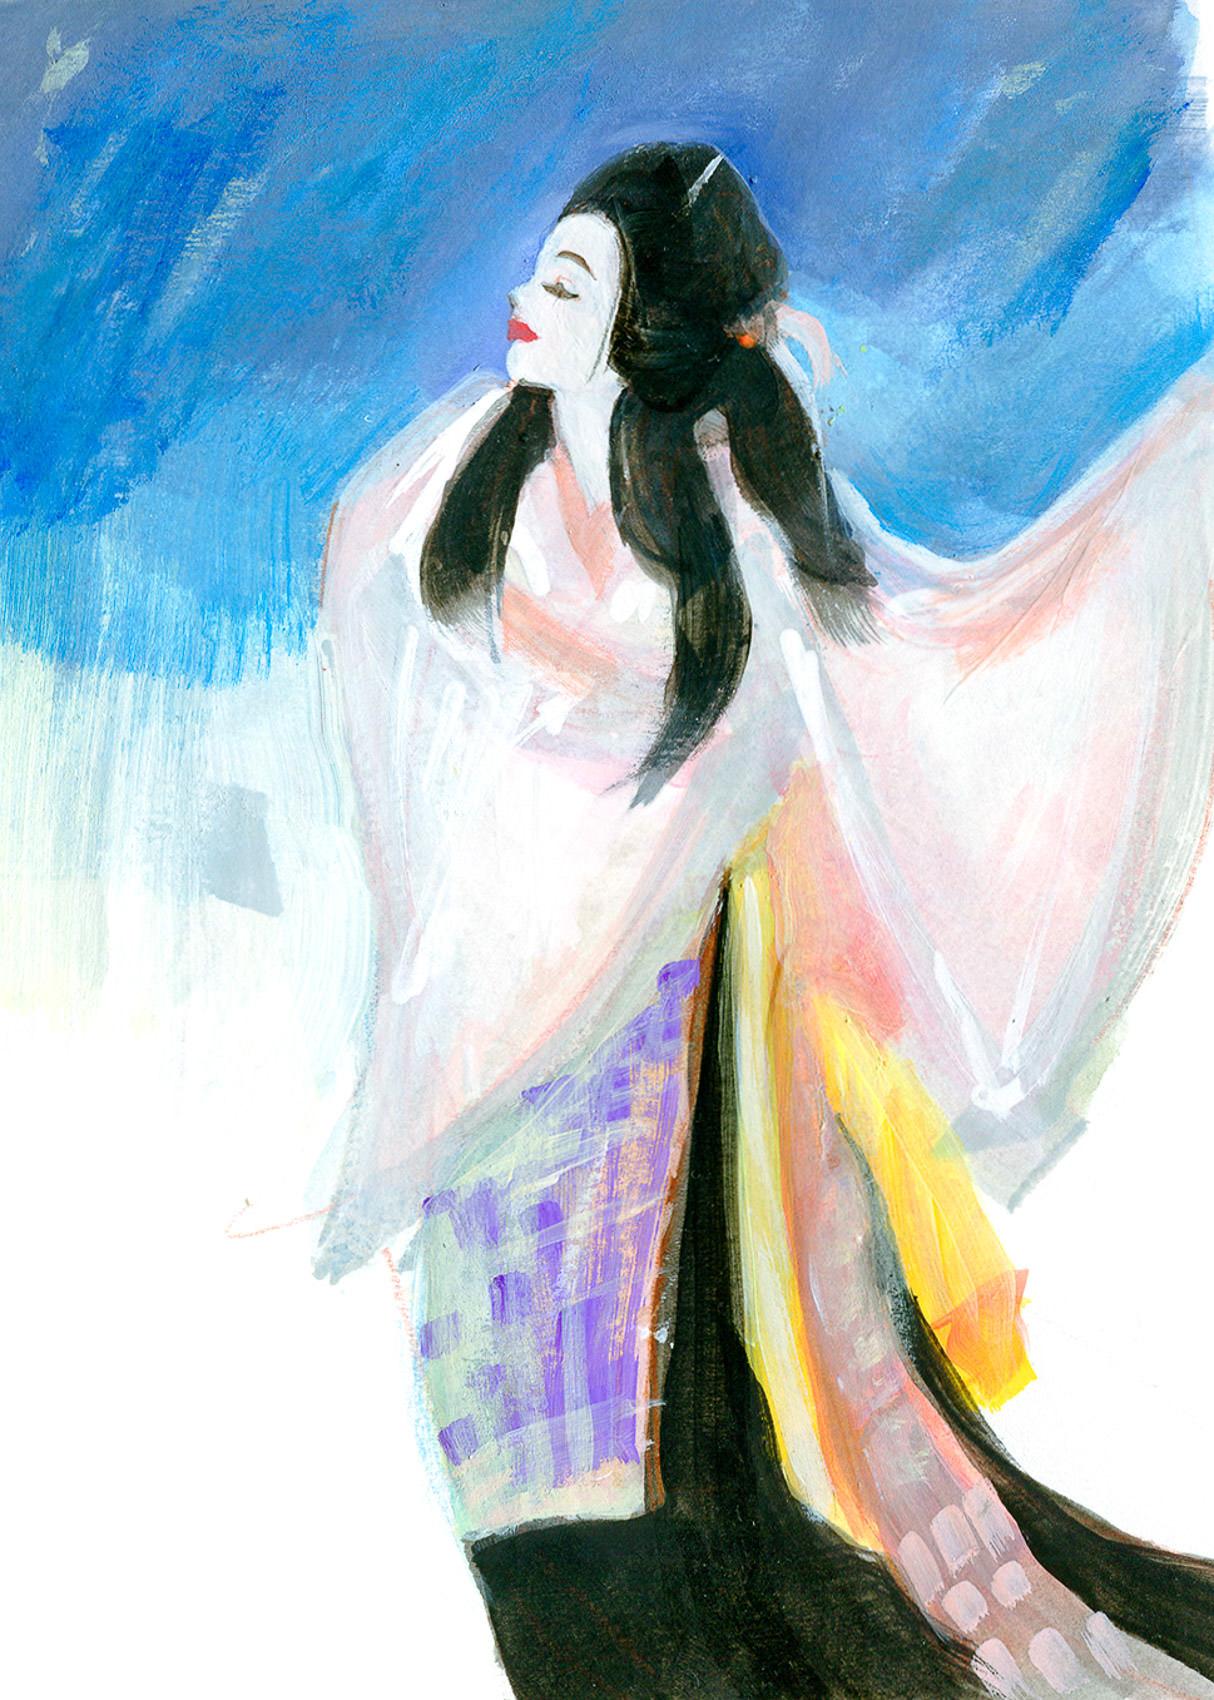 World Dance painted Illustration of Kabuki Yamanba, Japan